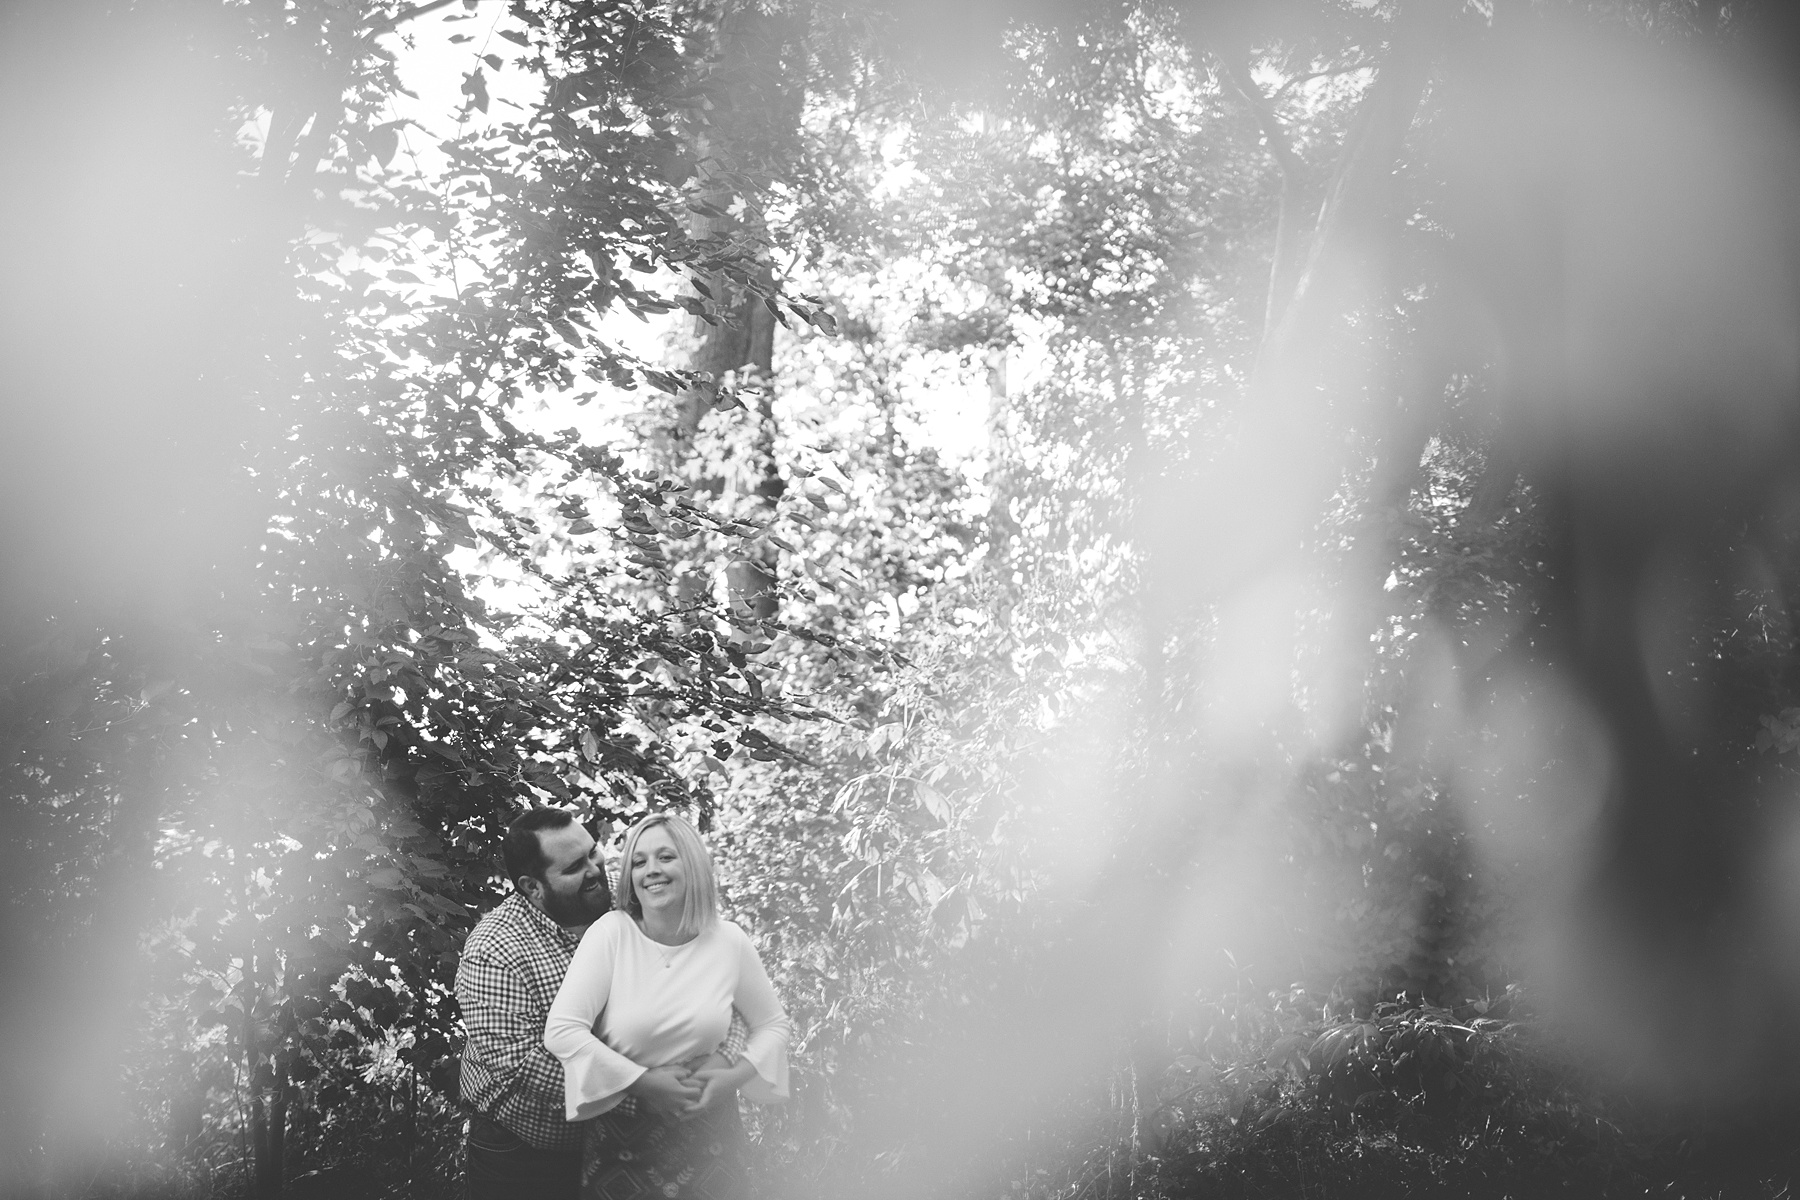 Brandon_Shafer_Photography_Megan_Nate_West_Michigan_Engagement_Photos_0003.jpg